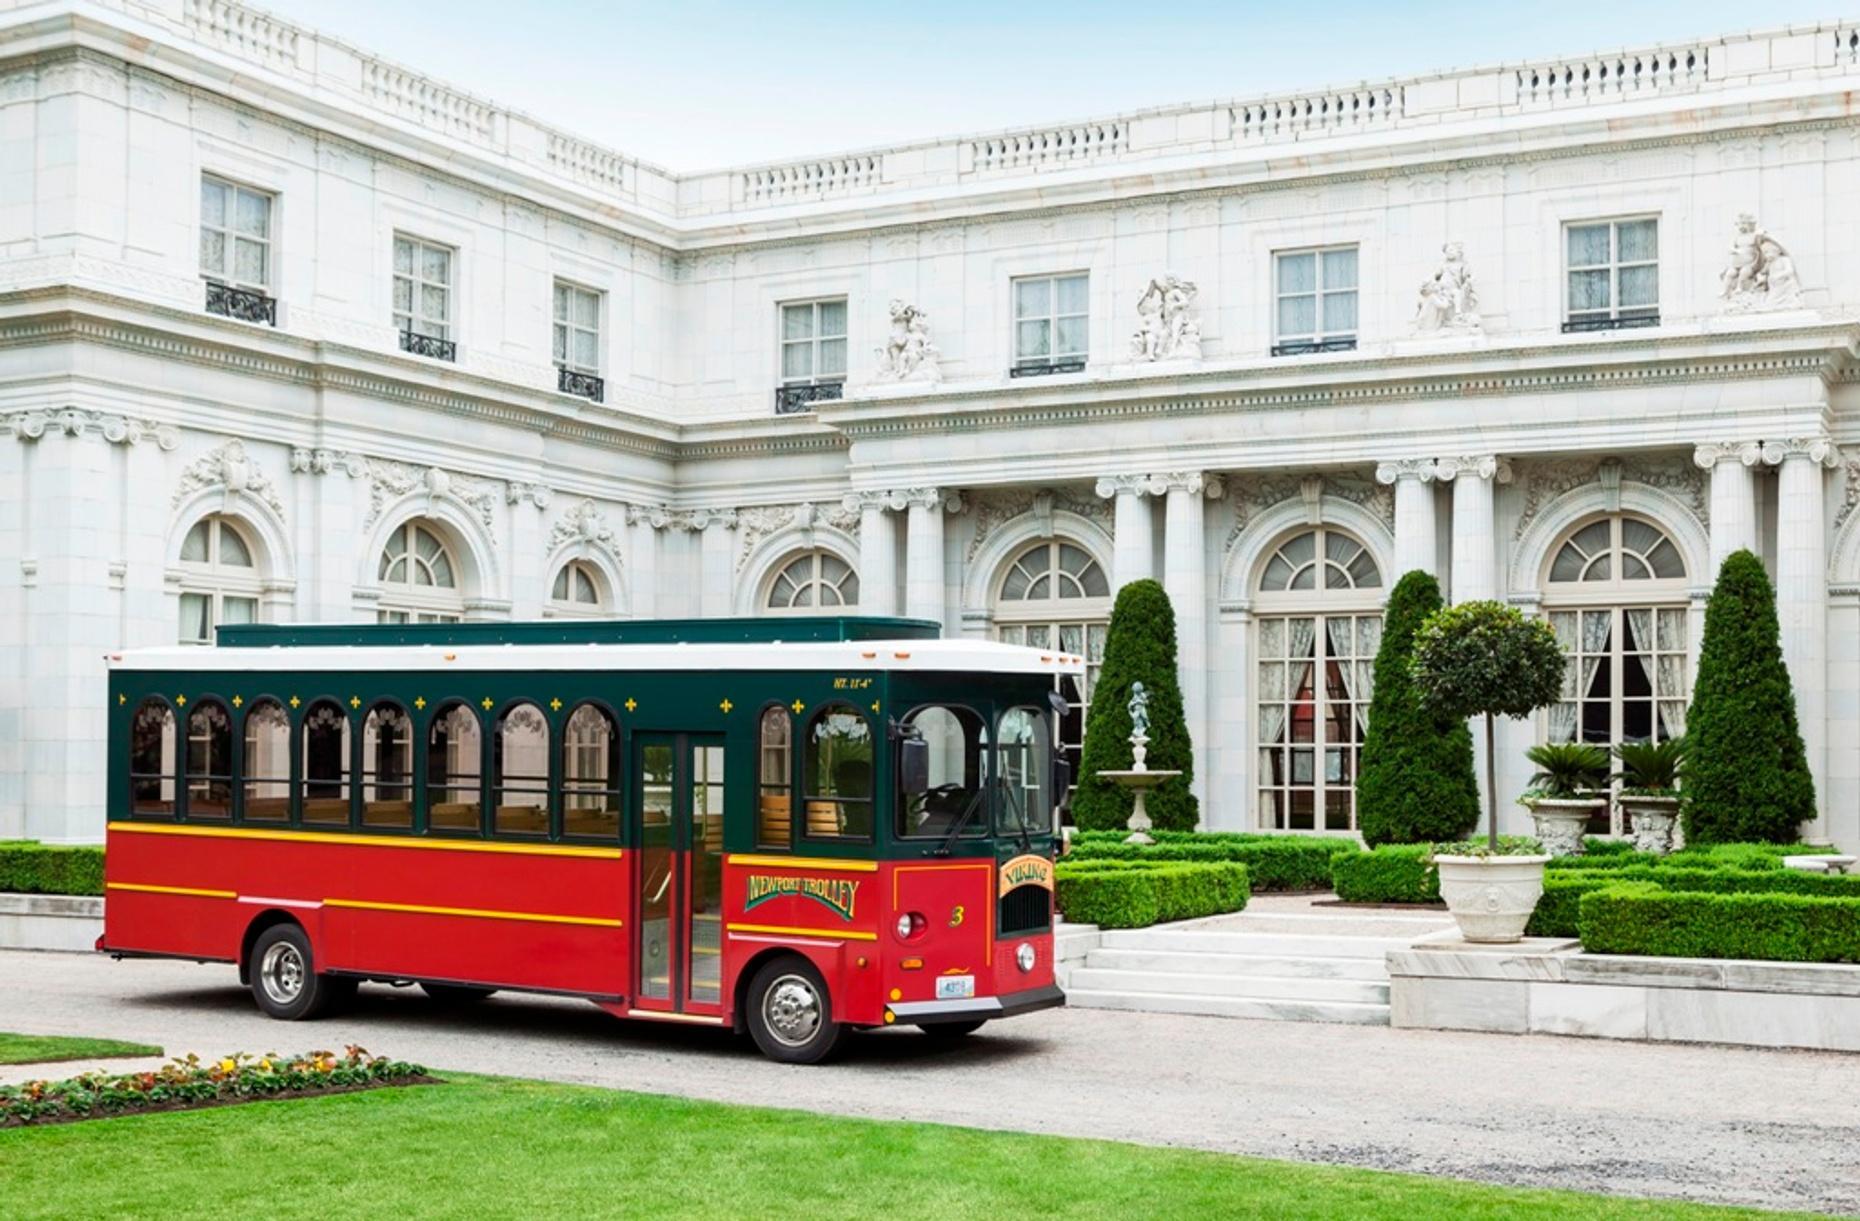 Vanderbilt Mansion Trolley Tour of Newport